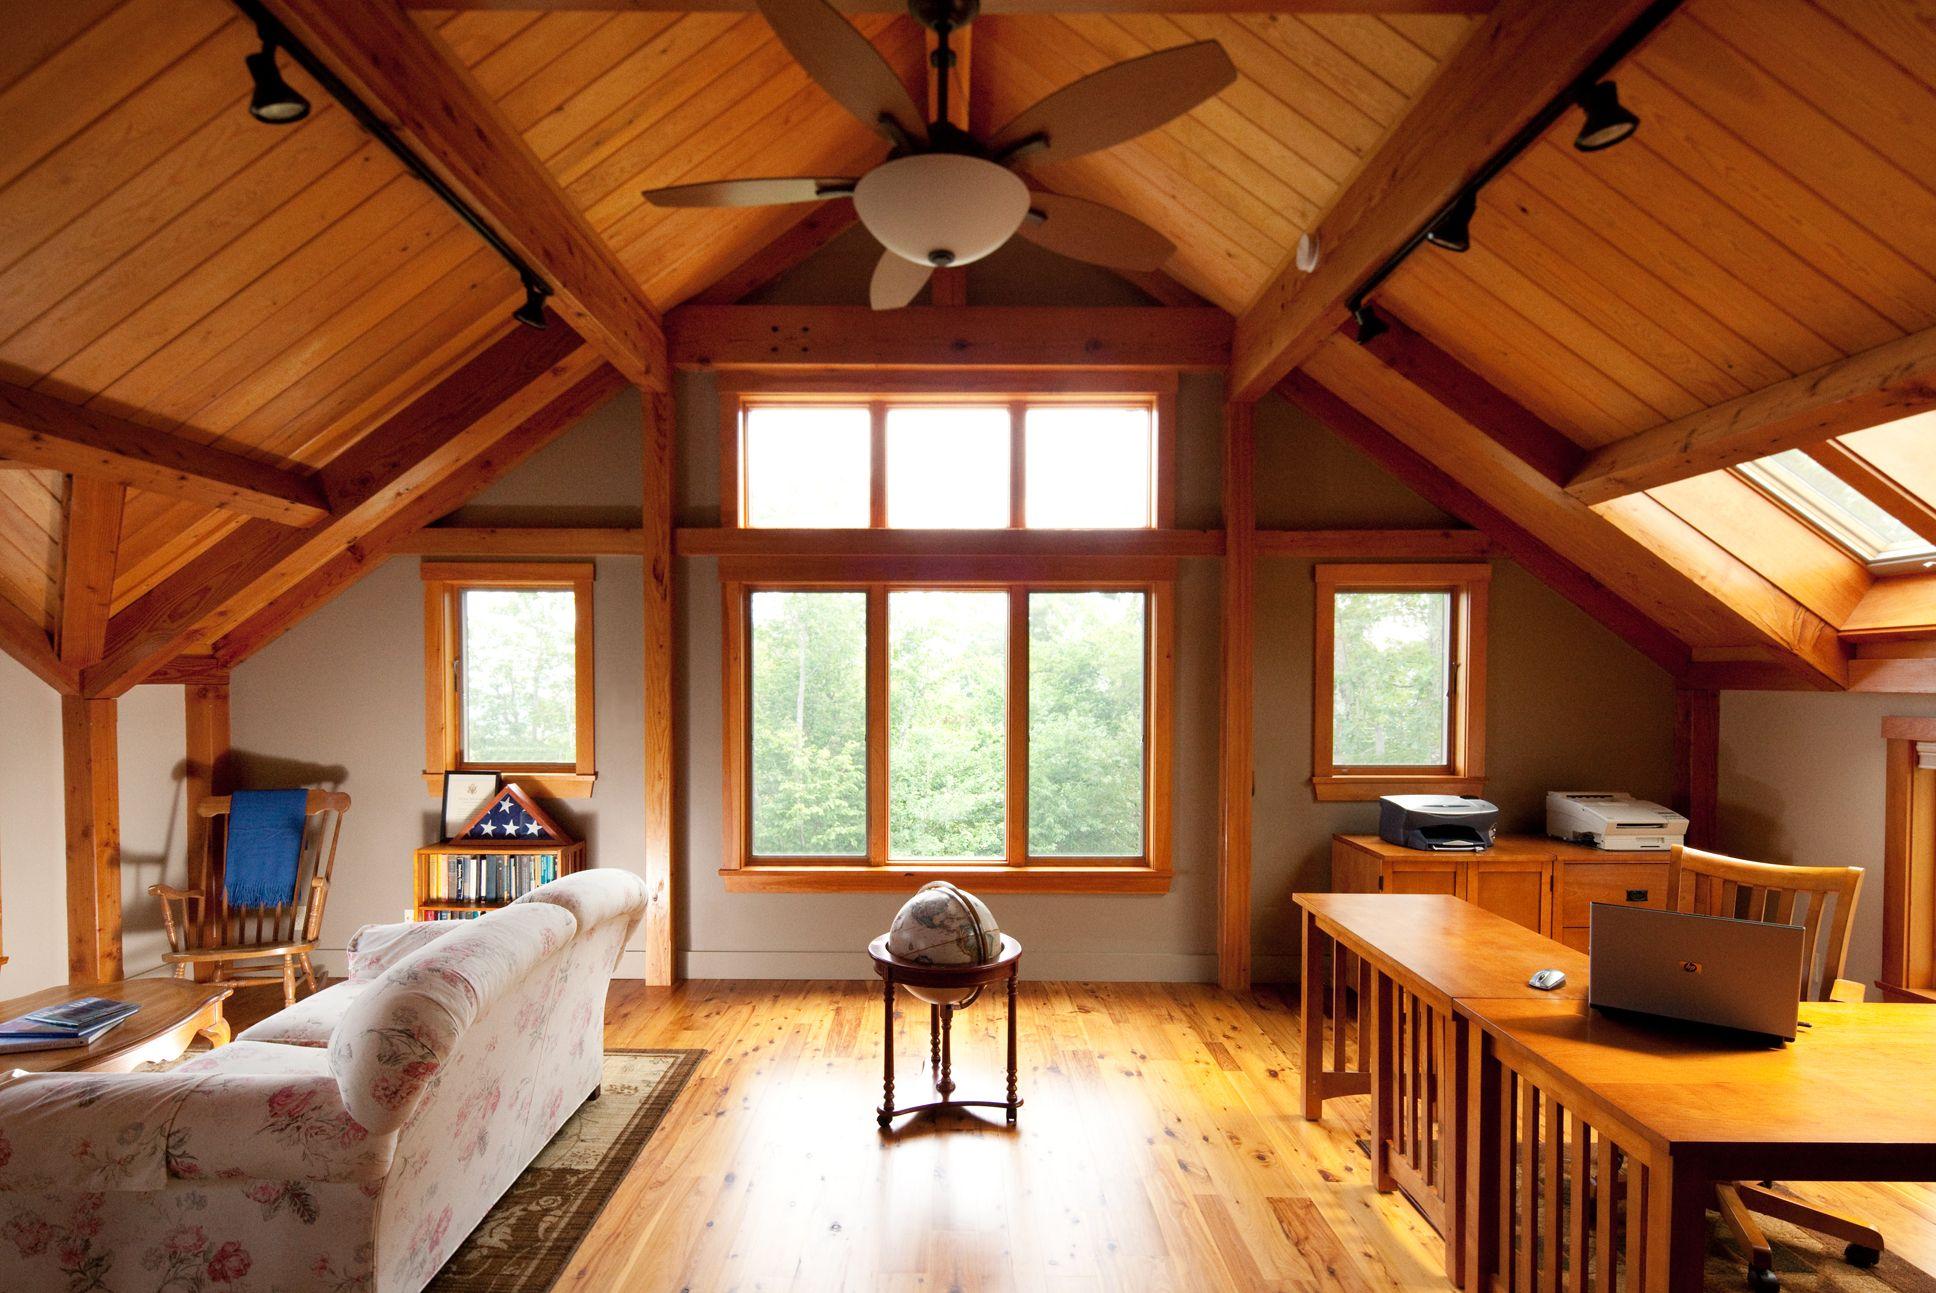 Barn Loft Apartment Ideas | Joy Studio Design Gallery ...